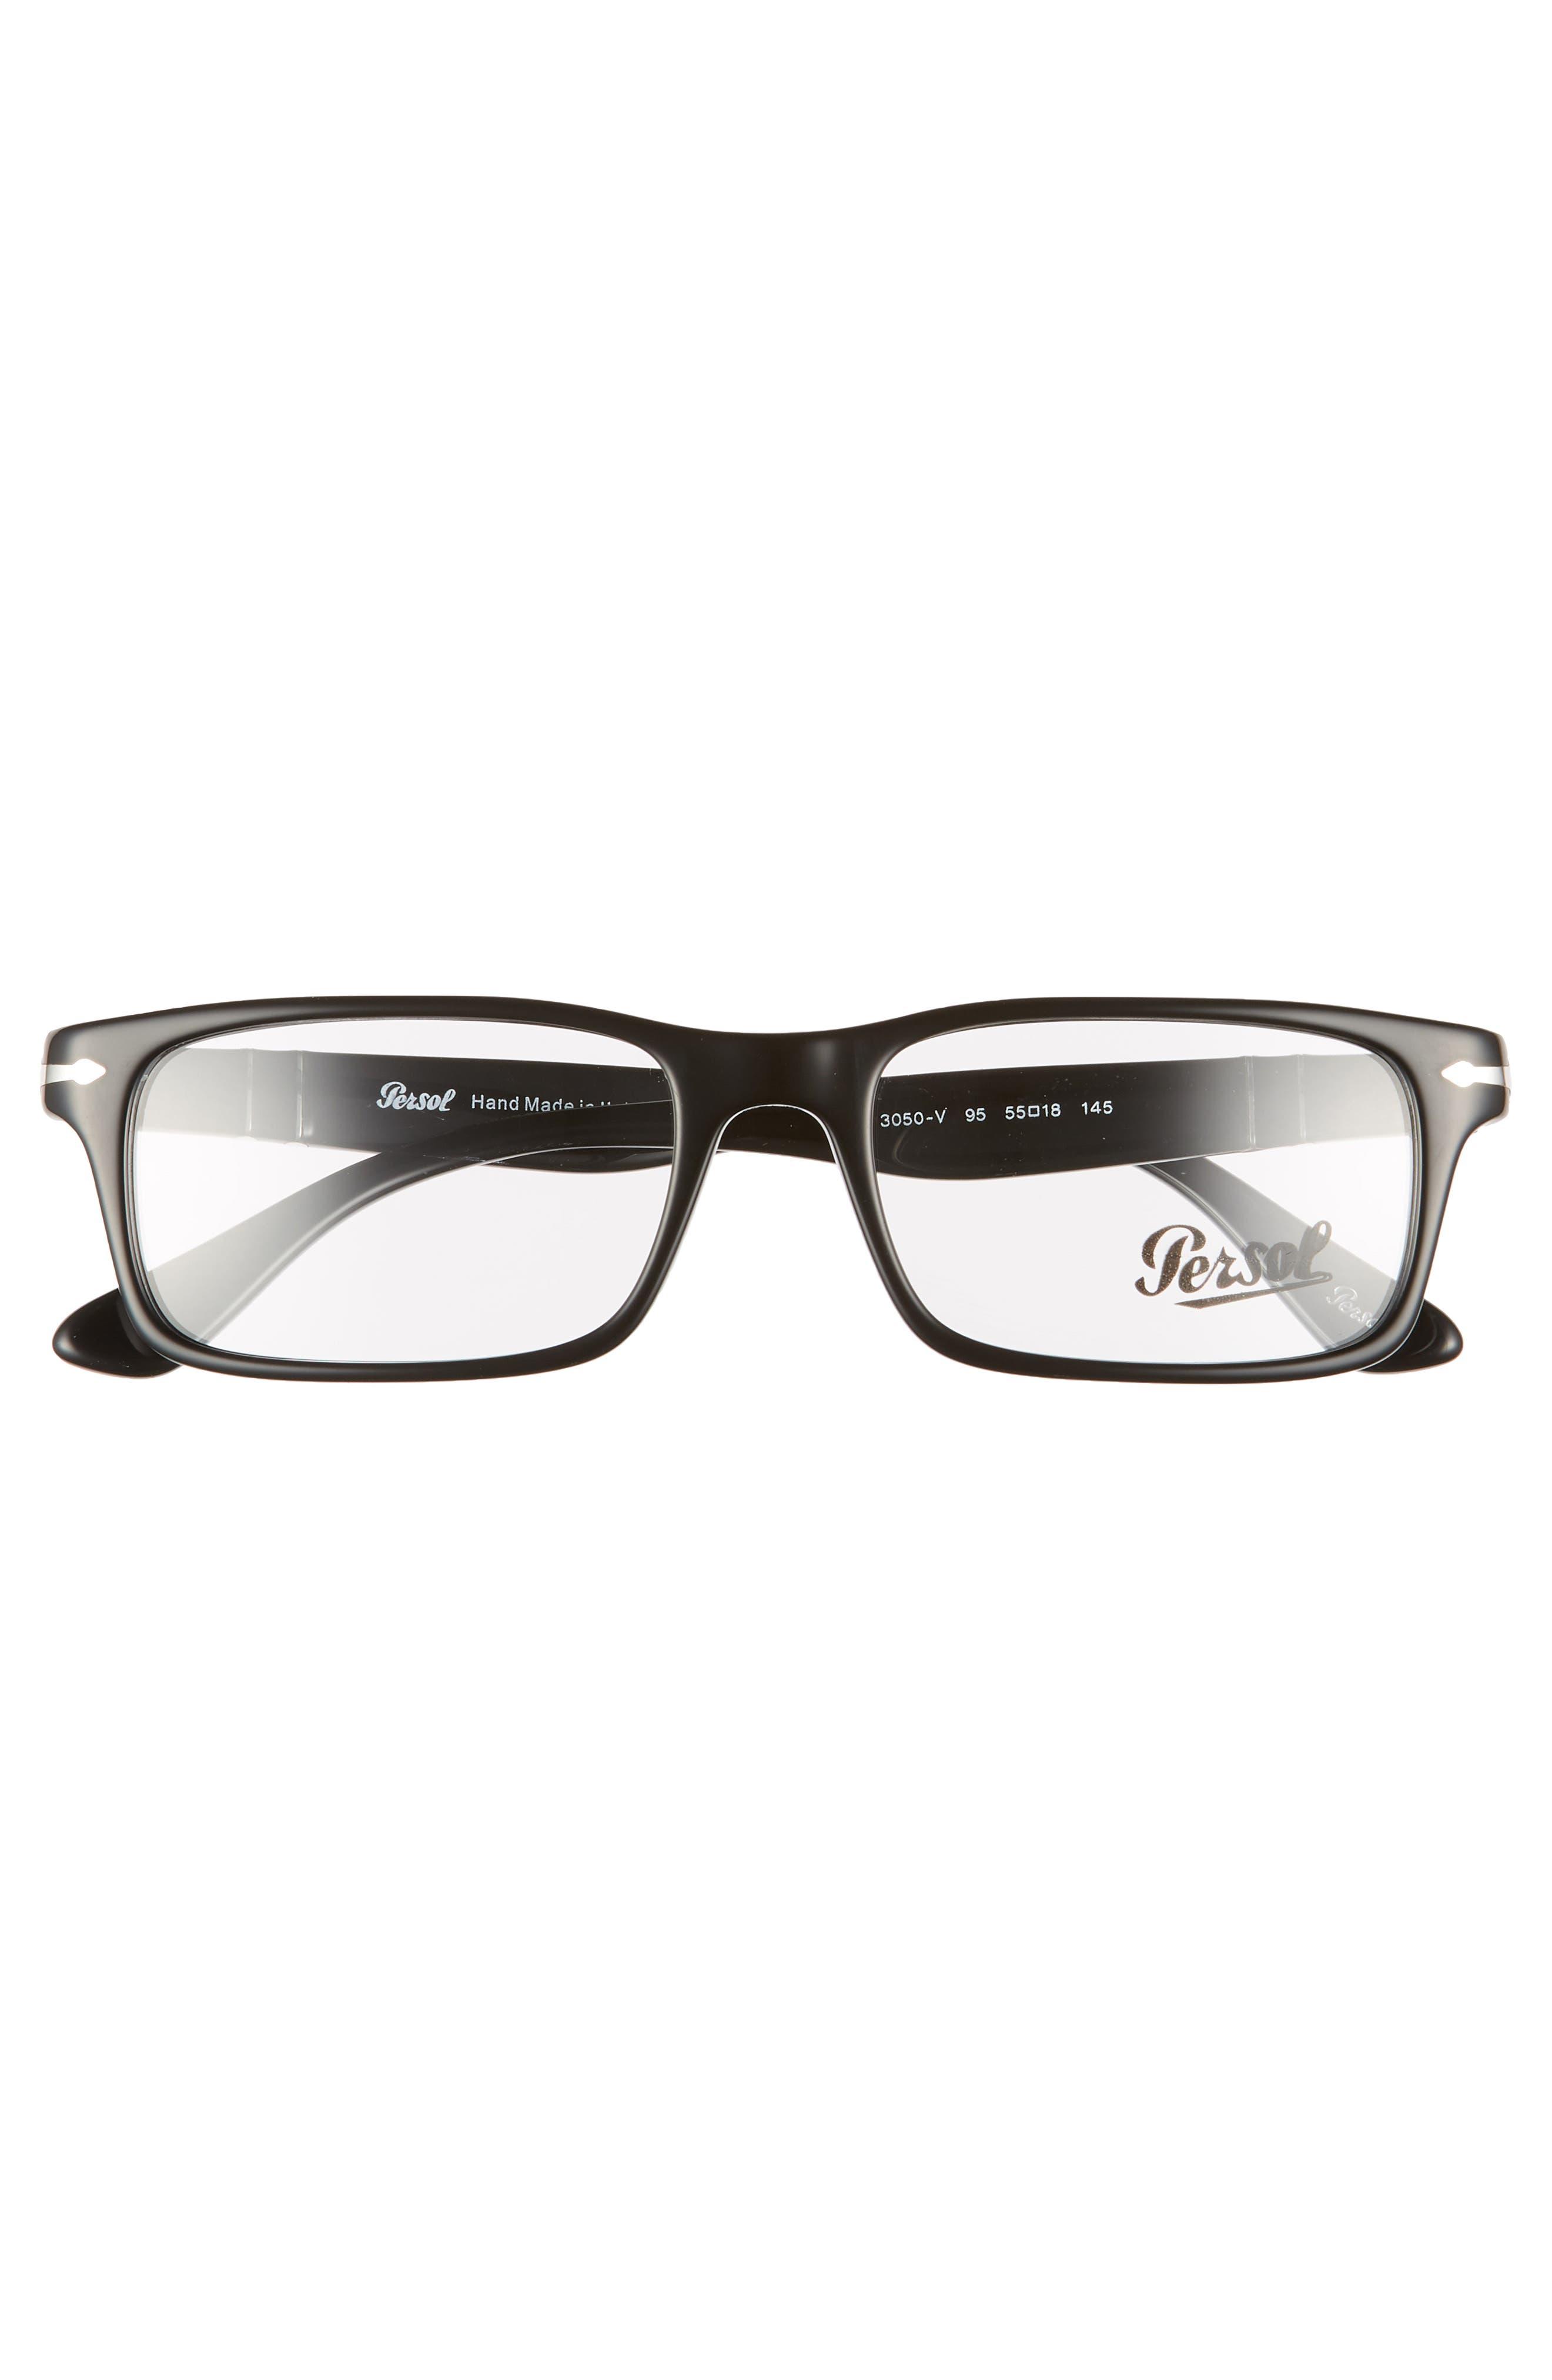 55mm Rectangle Optical Glasses,                             Alternate thumbnail 3, color,                             BLACK